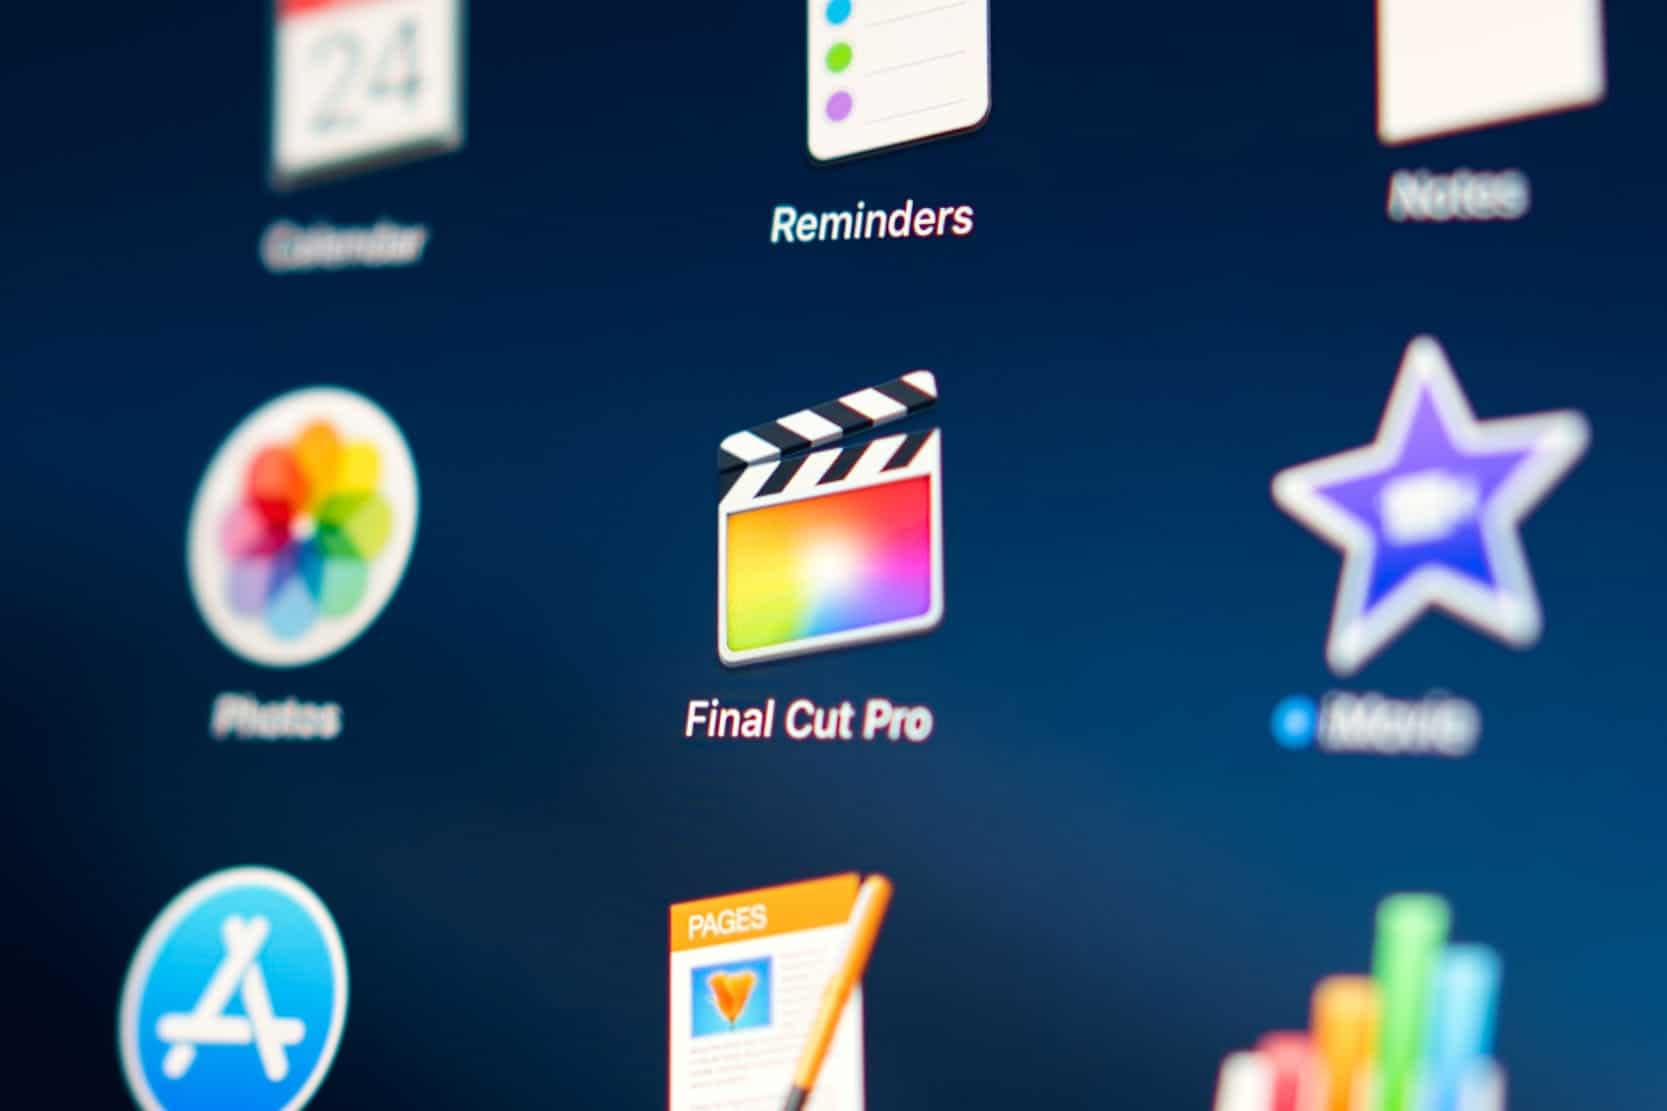 Final Cut Pro X app on Mac Dashboard